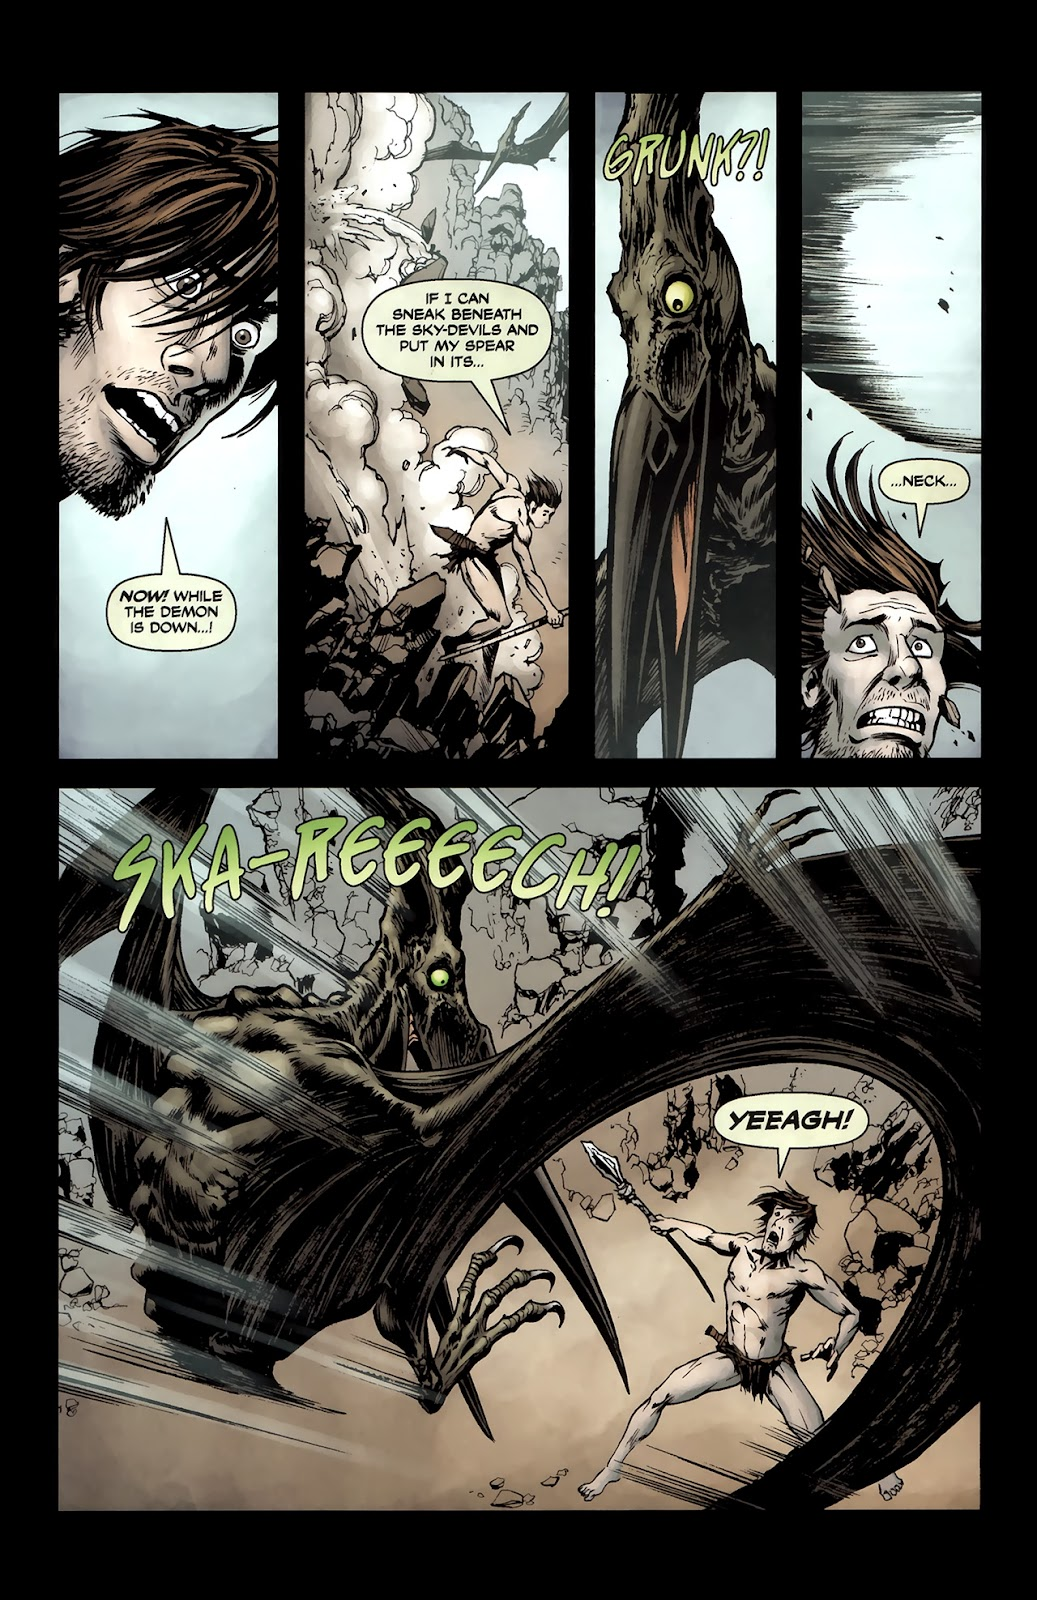 Read online Tyrannosaurus Rex comic -  Issue # Full - 12